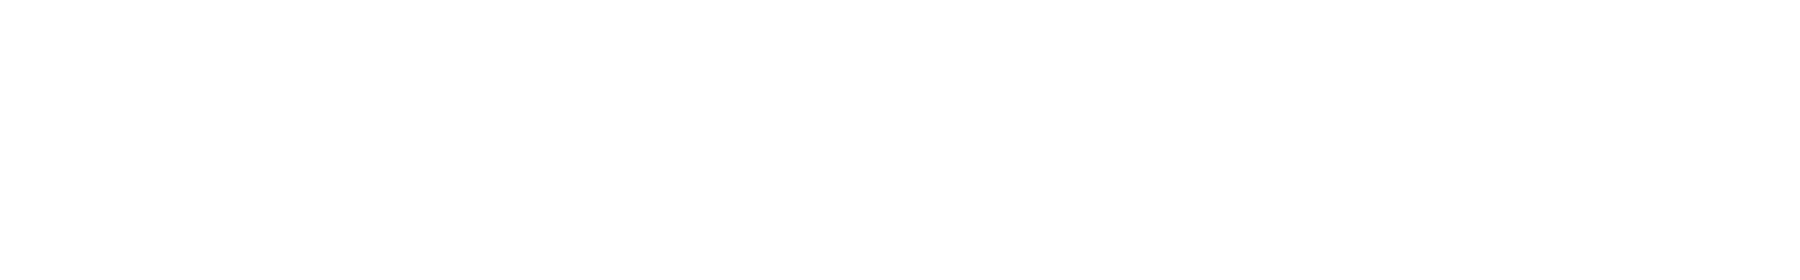 151 beatboxing